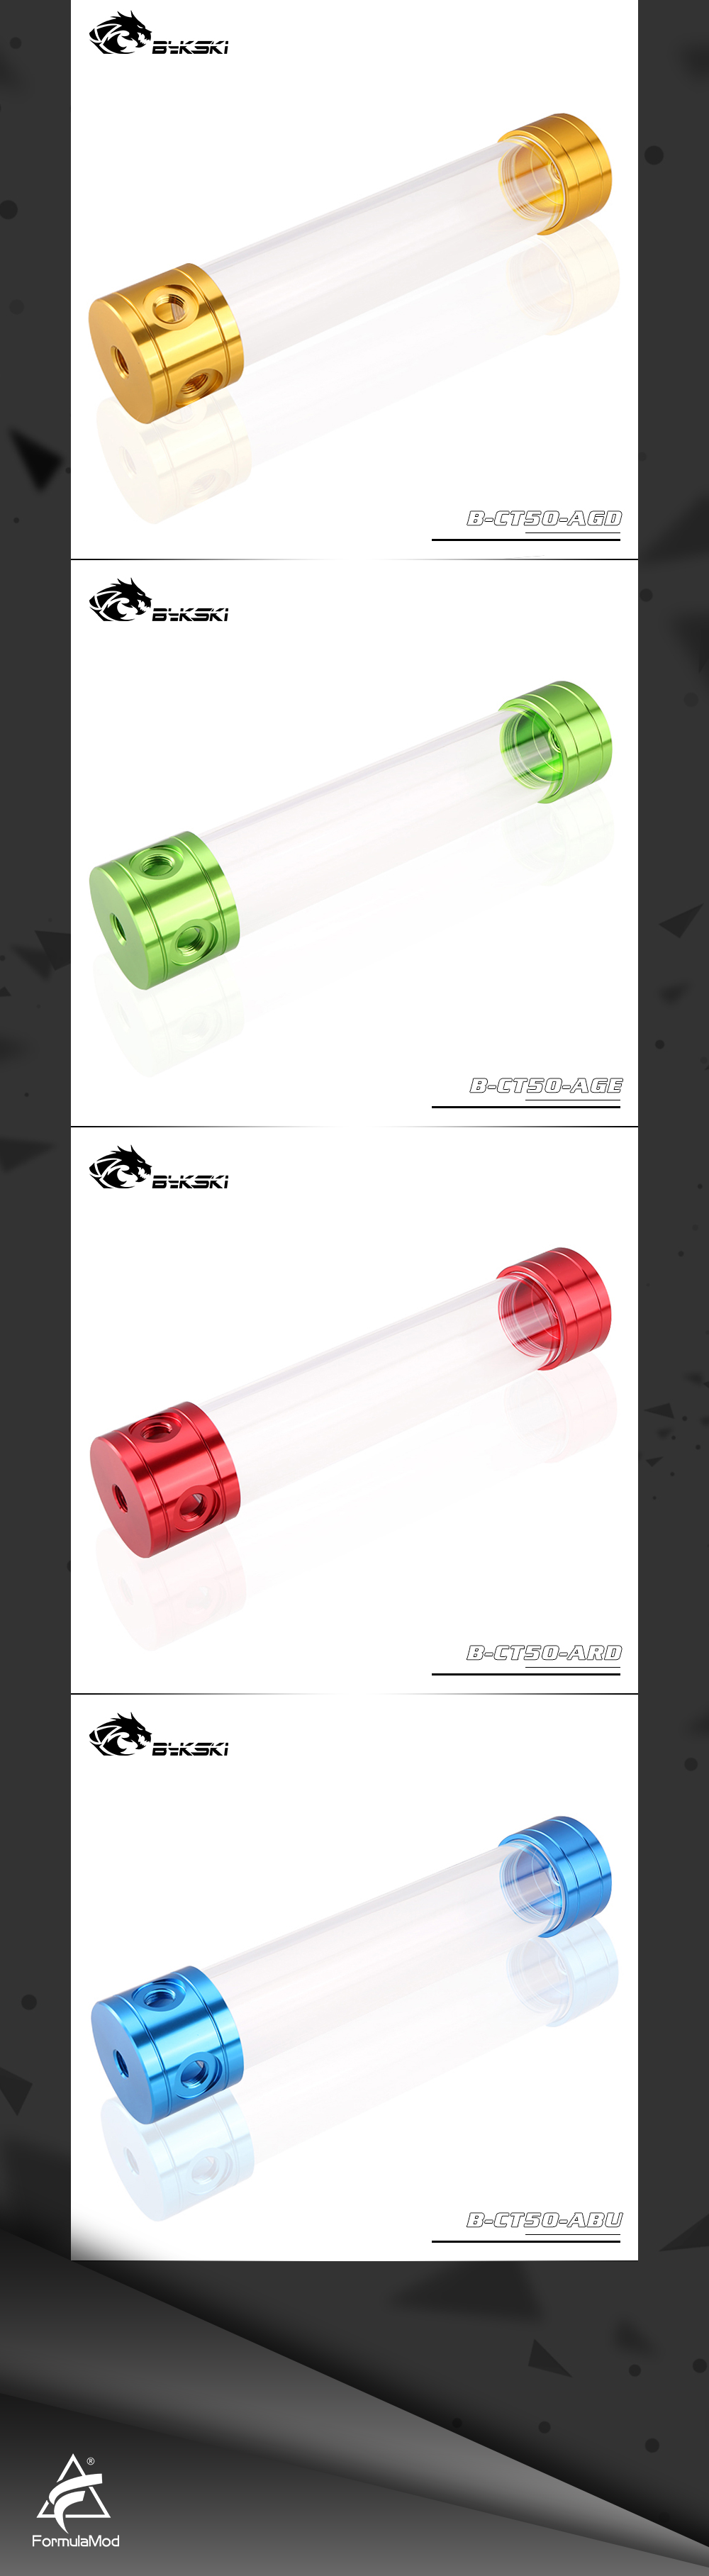 Bykski B-CT50-AL, 50mm Cylinder Reservoirs, Aluminum Alloy Cover Acrylic Body, 50mm Diameter 150/200/260mm Length